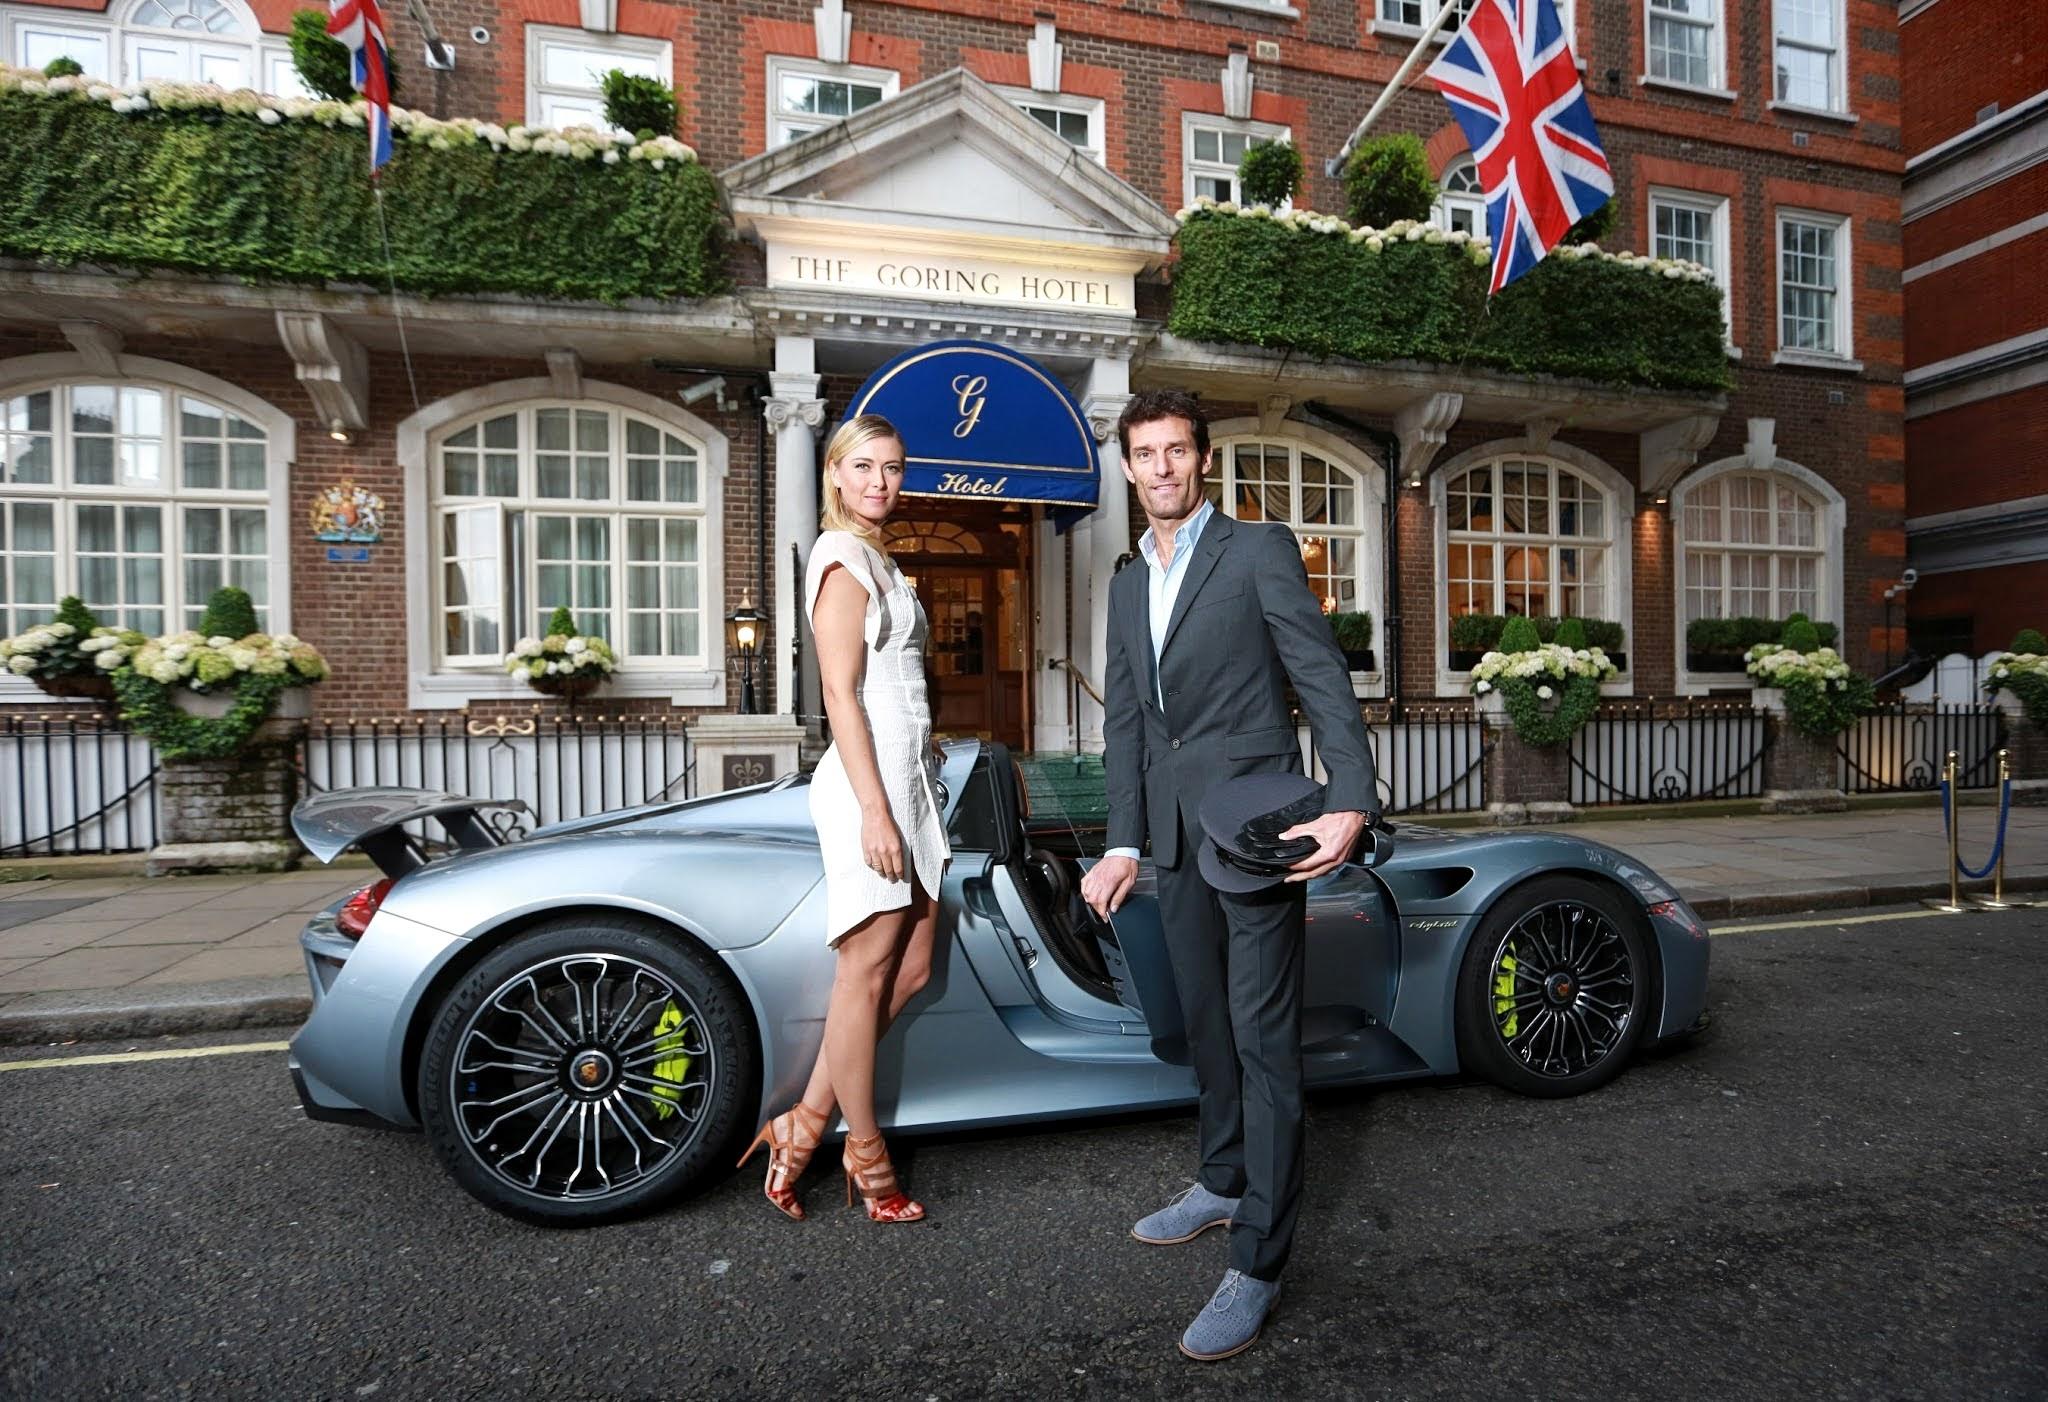 Maria_Sharapova_and_Mark_Webber_and_Porsche_918_Spyder Remarkable Porsche 918 Spyder In London Cars Trend